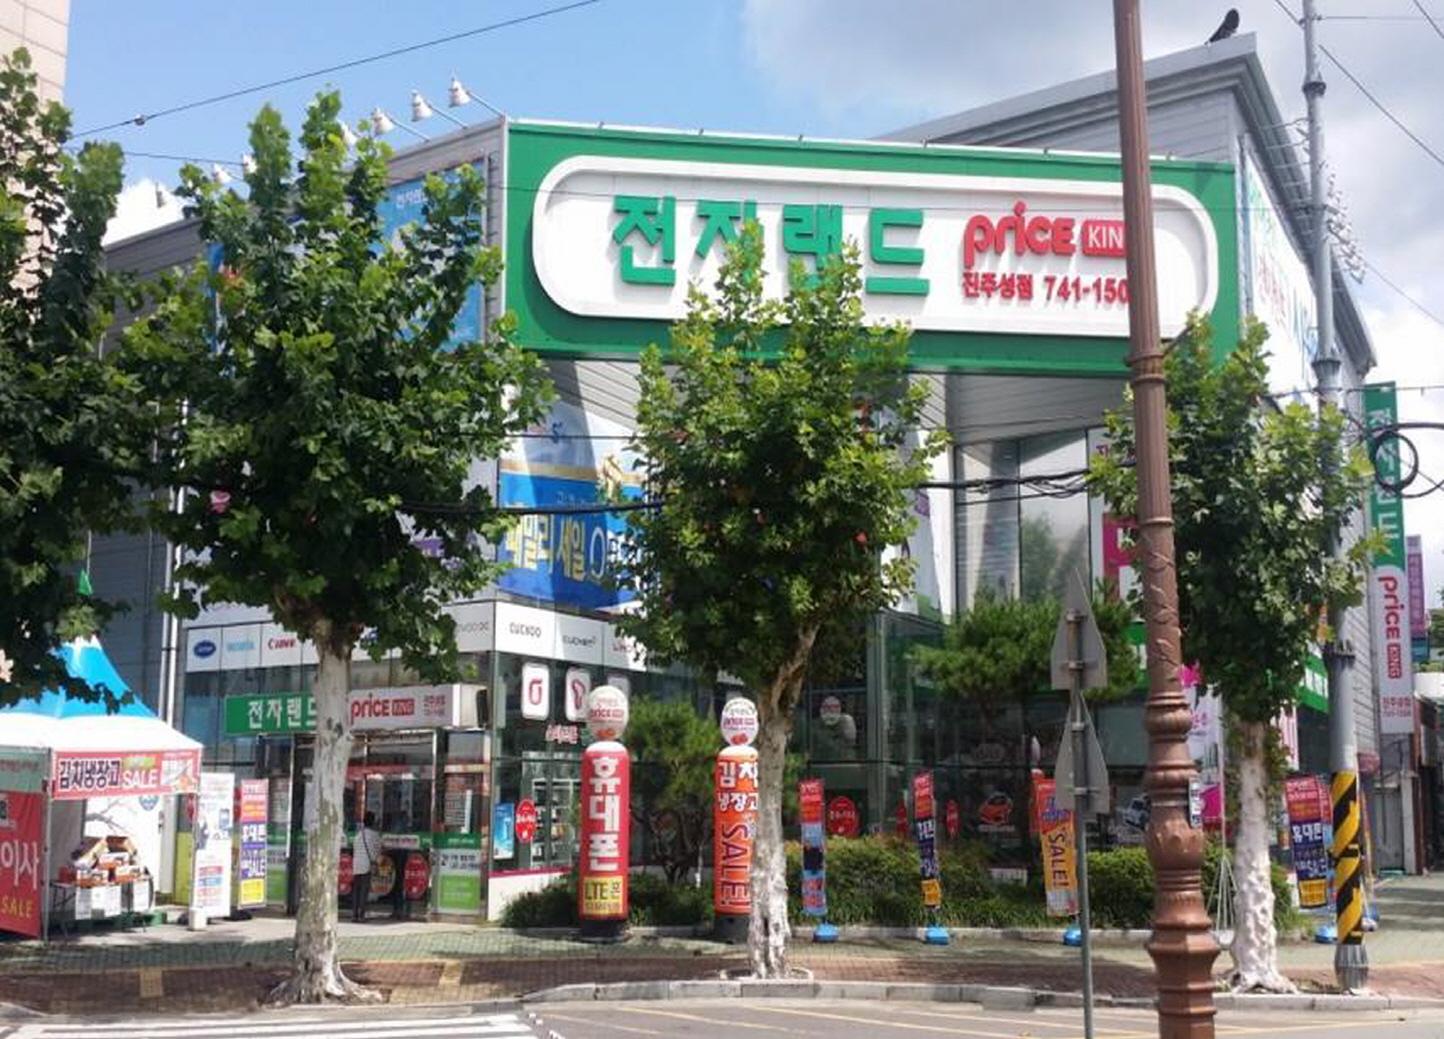 ET Land Price King – Jinjuseong Branch (전자랜드 프라이스킹 (진주성점))